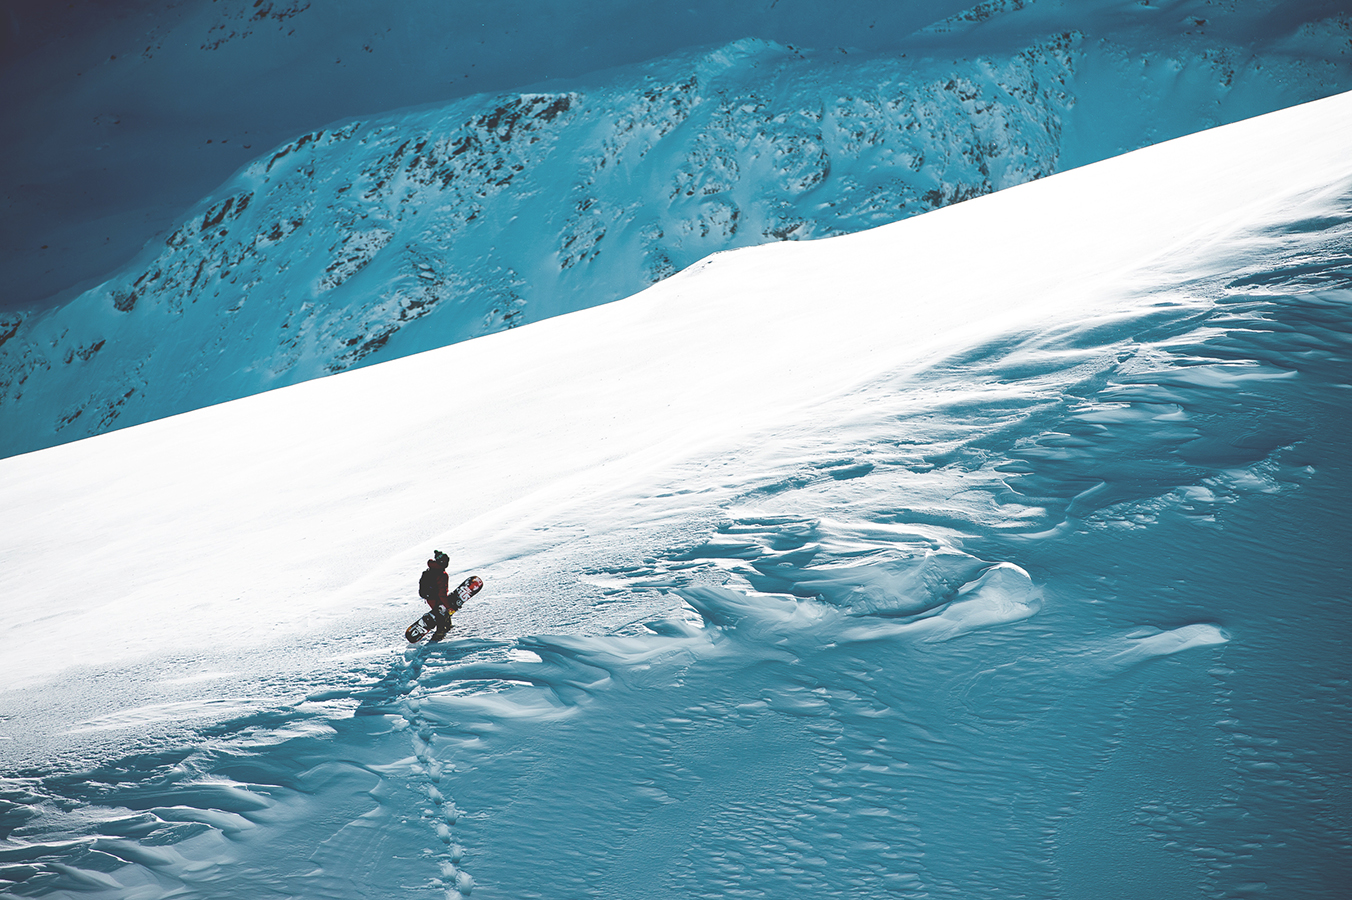 NicolasMüller_Hike_Snowboard_StMoritz_SilvanoZeiter_2.jpg